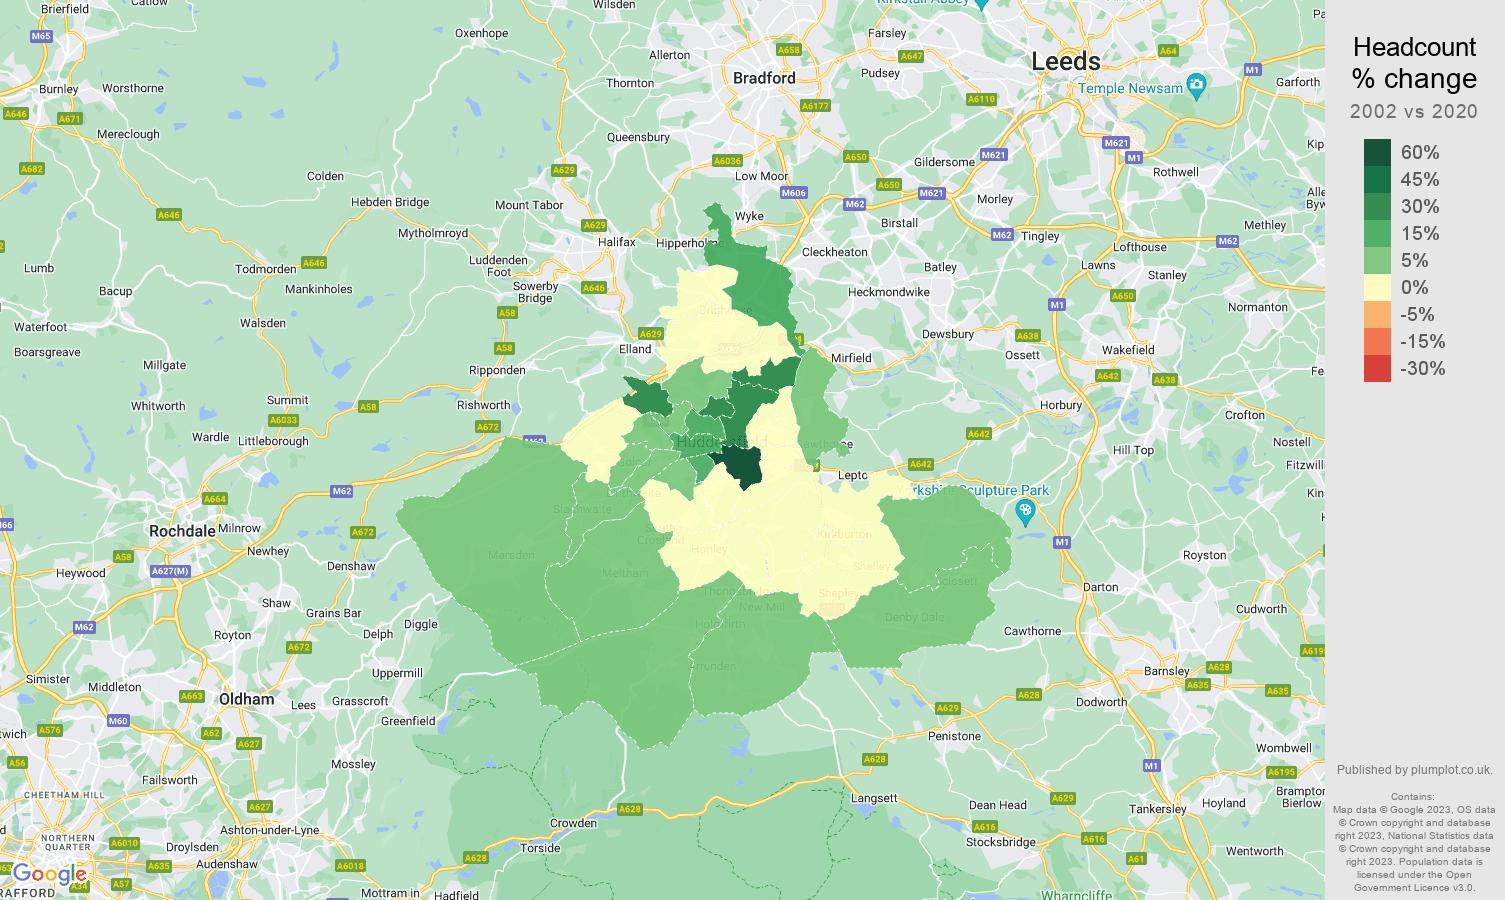 Huddersfield headcount change map